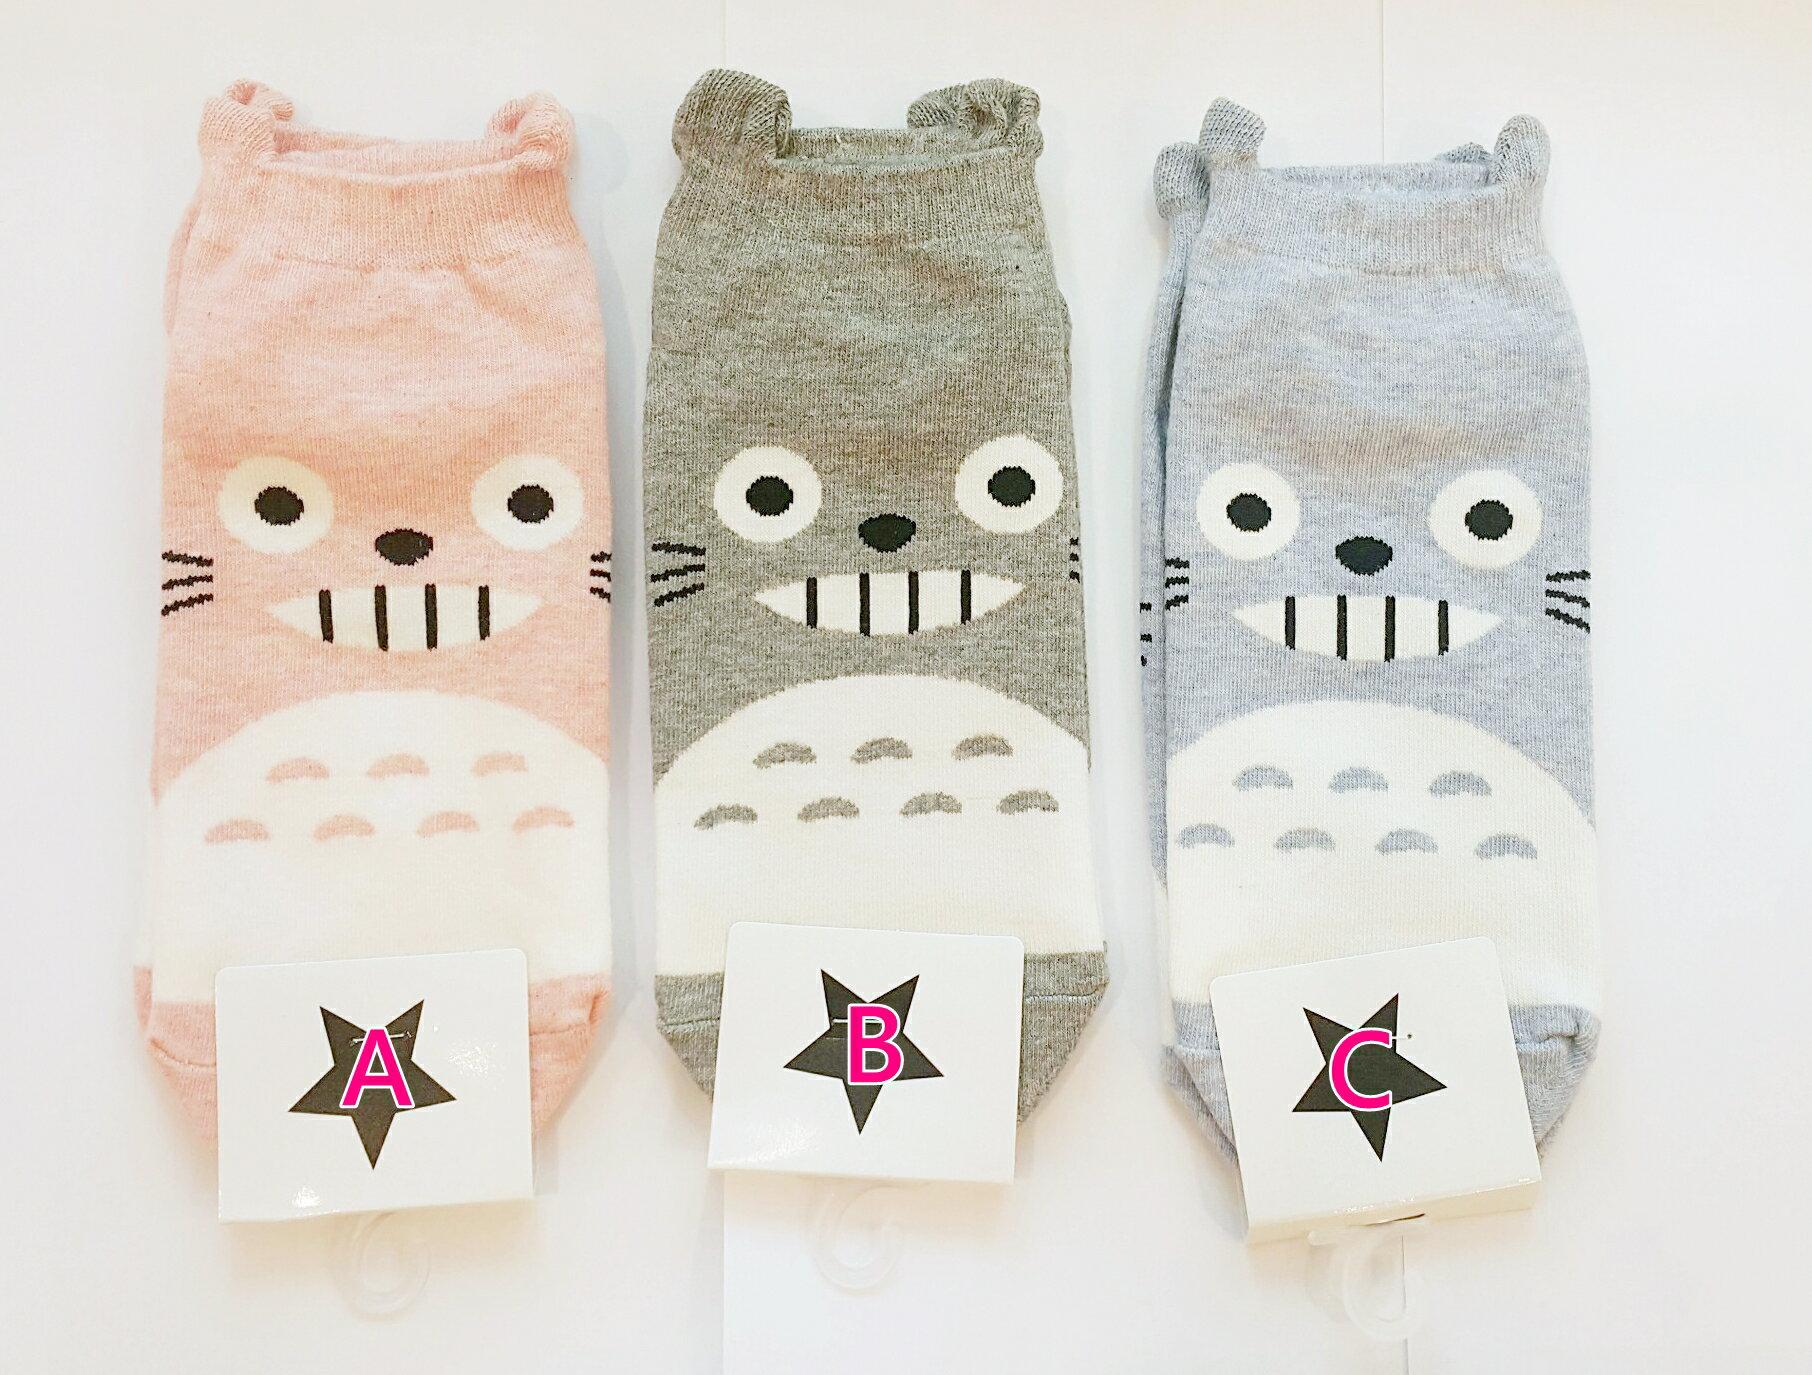 X射線【C190003】KIsssocks 龍貓Totoro 短襪(22-25cm)3款選1,大人/小孩短襪/船型襪/sanrio卡通/襪子